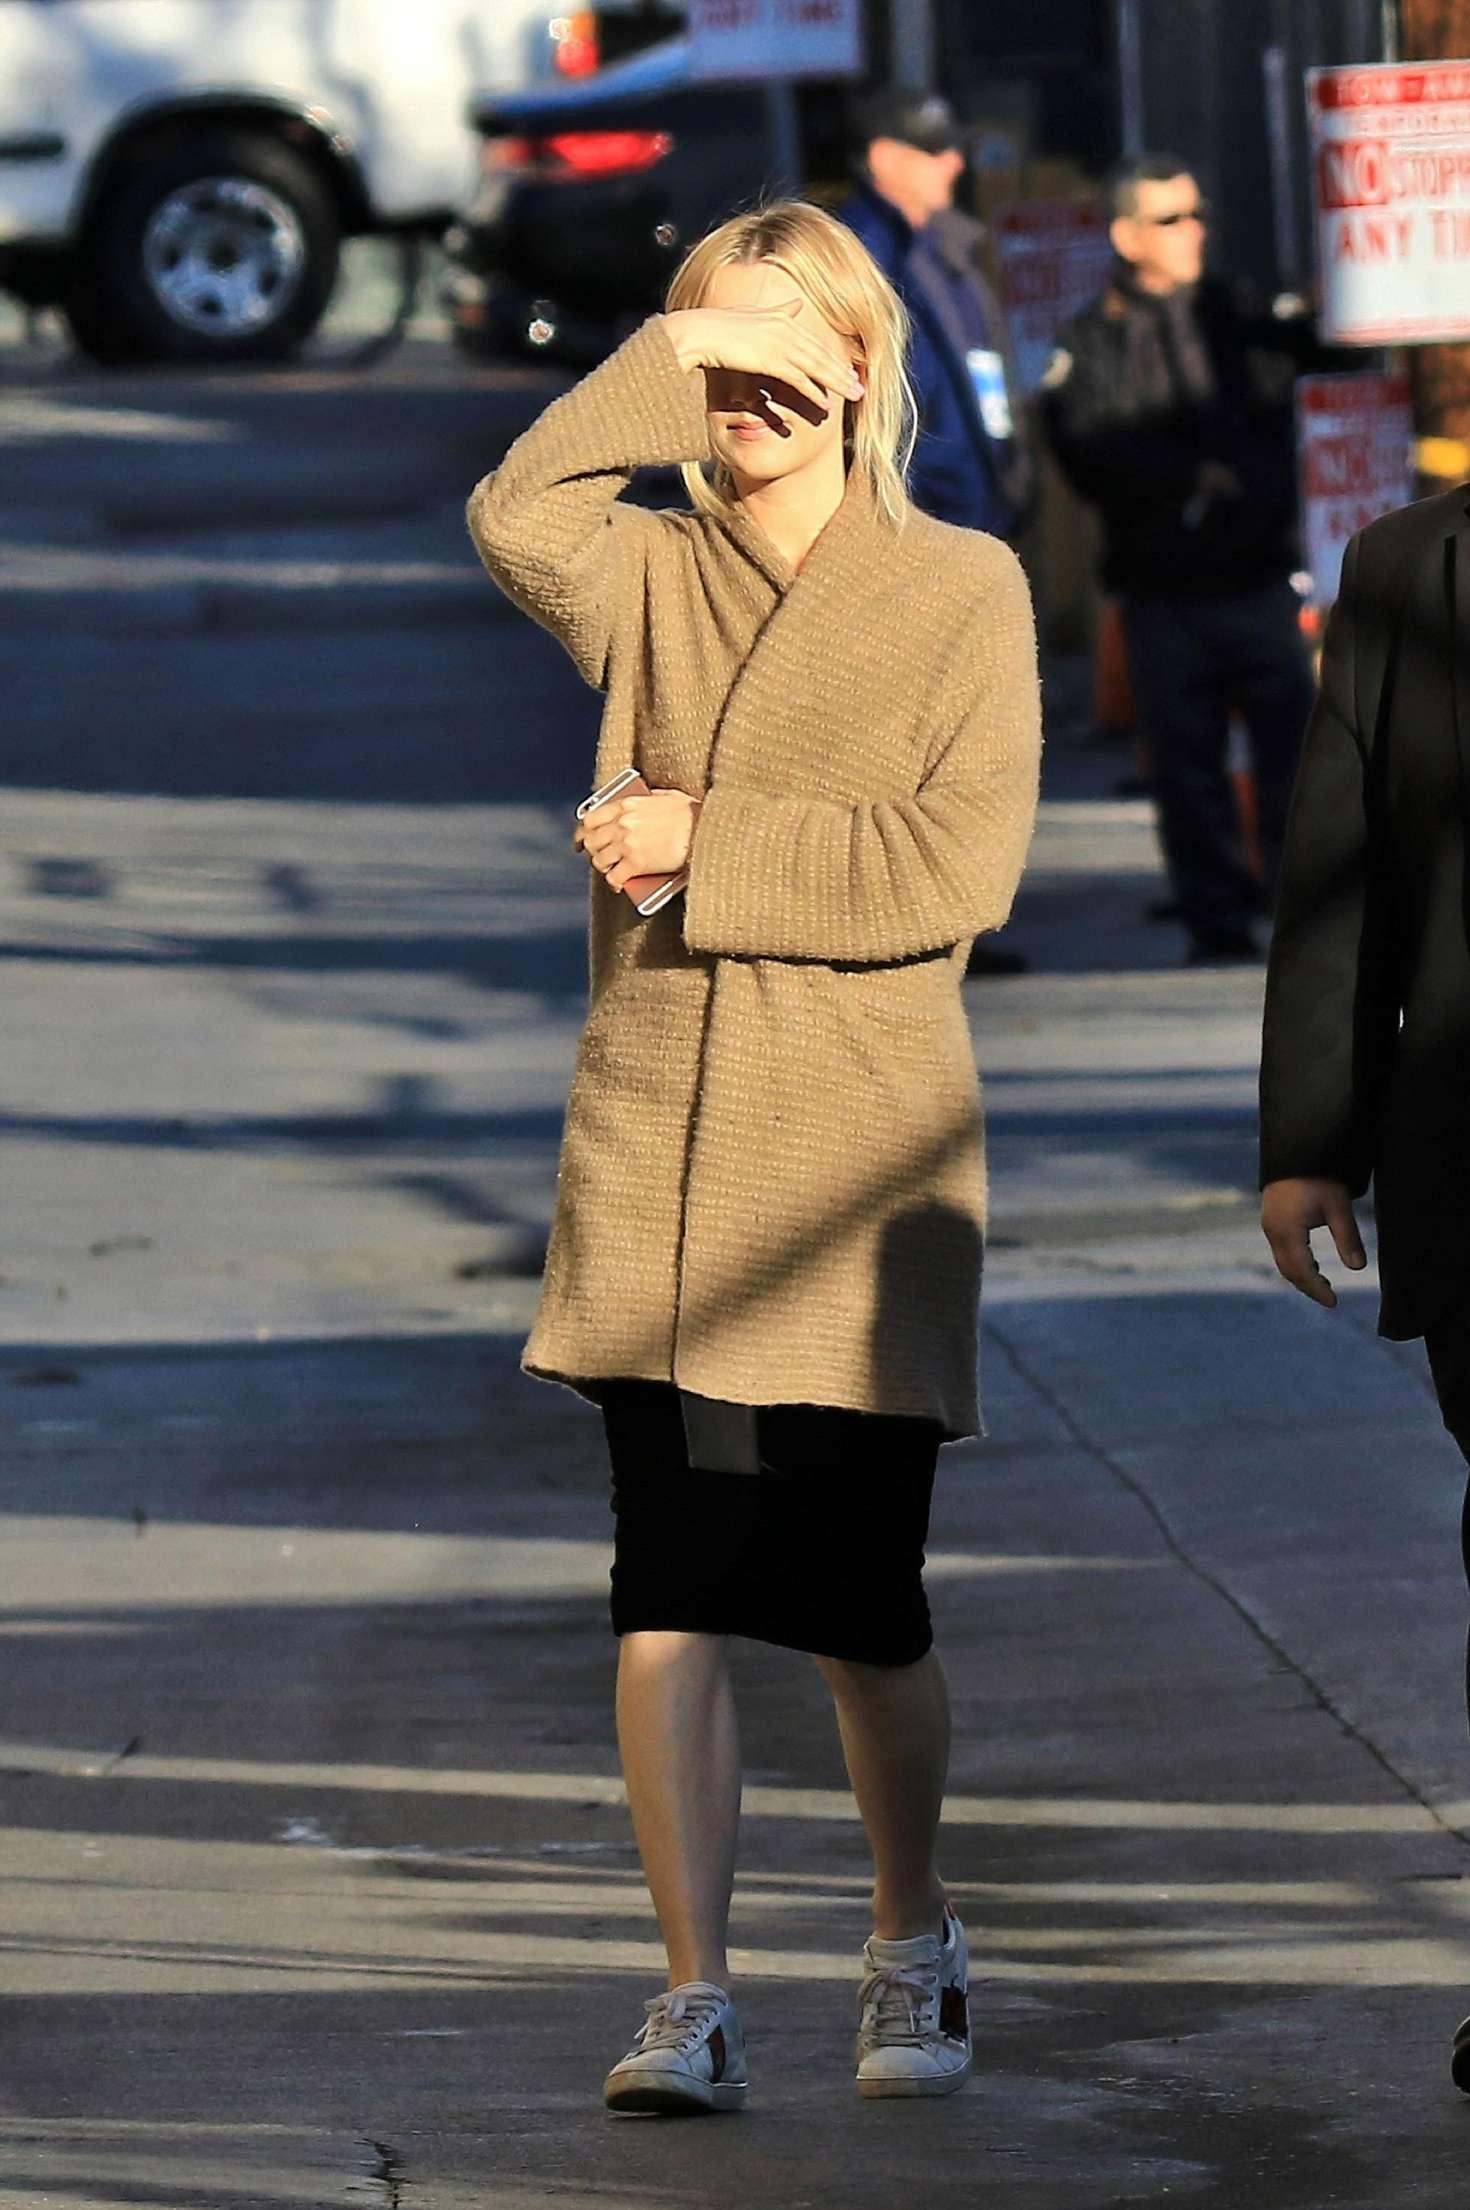 Saoirse Ronan 2018 : Saoirse Ronan: Arriving at Jimmy Kimmel Live -13